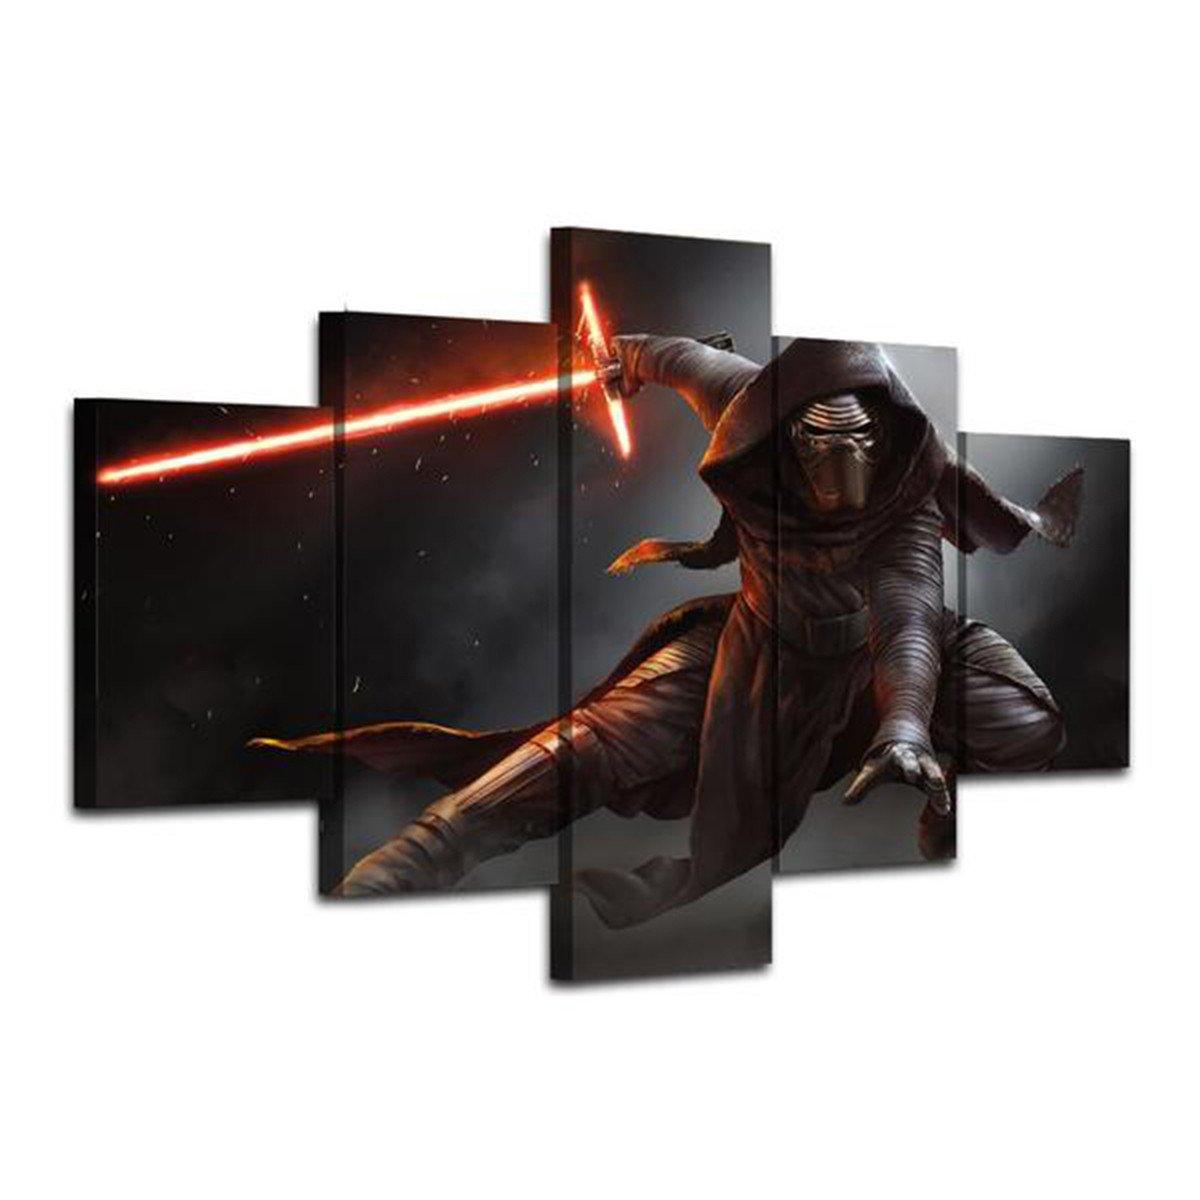 Star Wars 5 Piece Wall Art Canvas Prints (30x40cm, 30x60cm, 30x80cm)